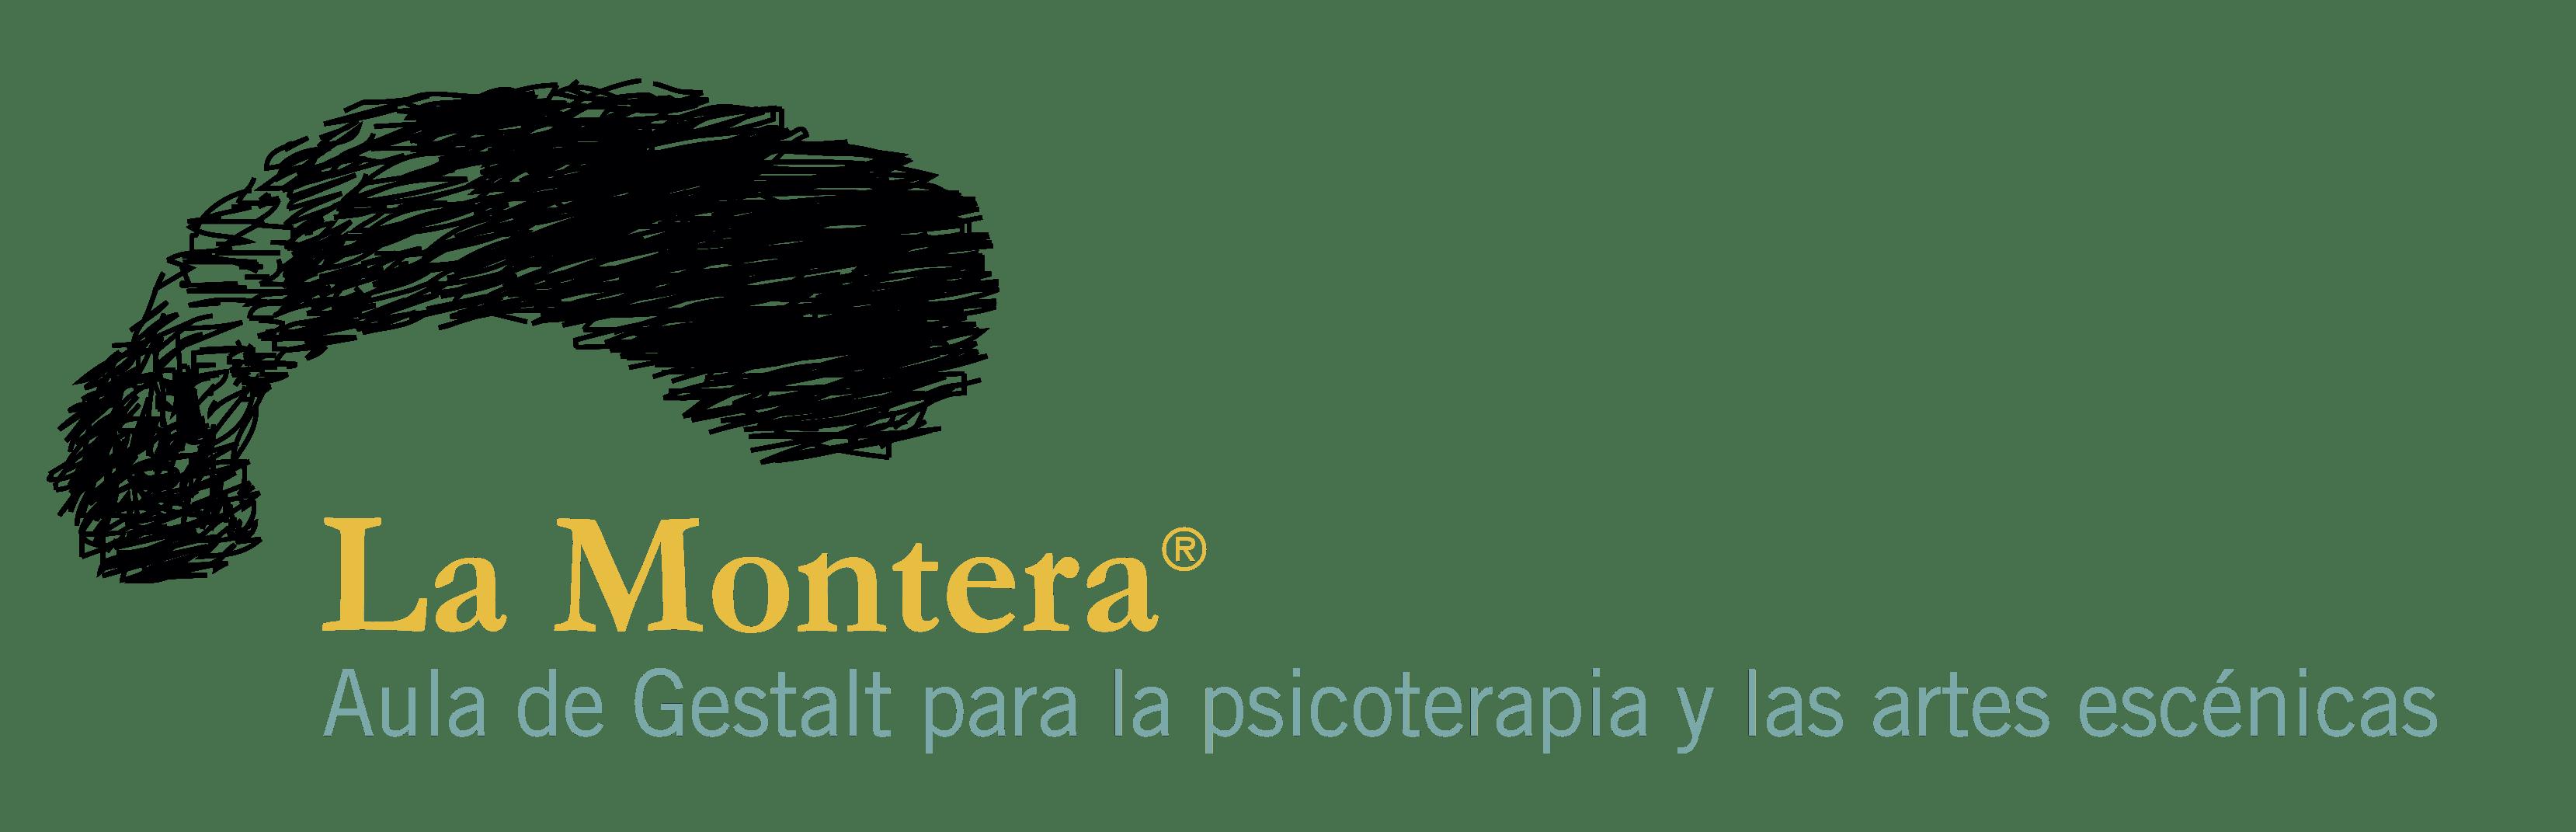 lOGOTIPO aULA LA mONTERA